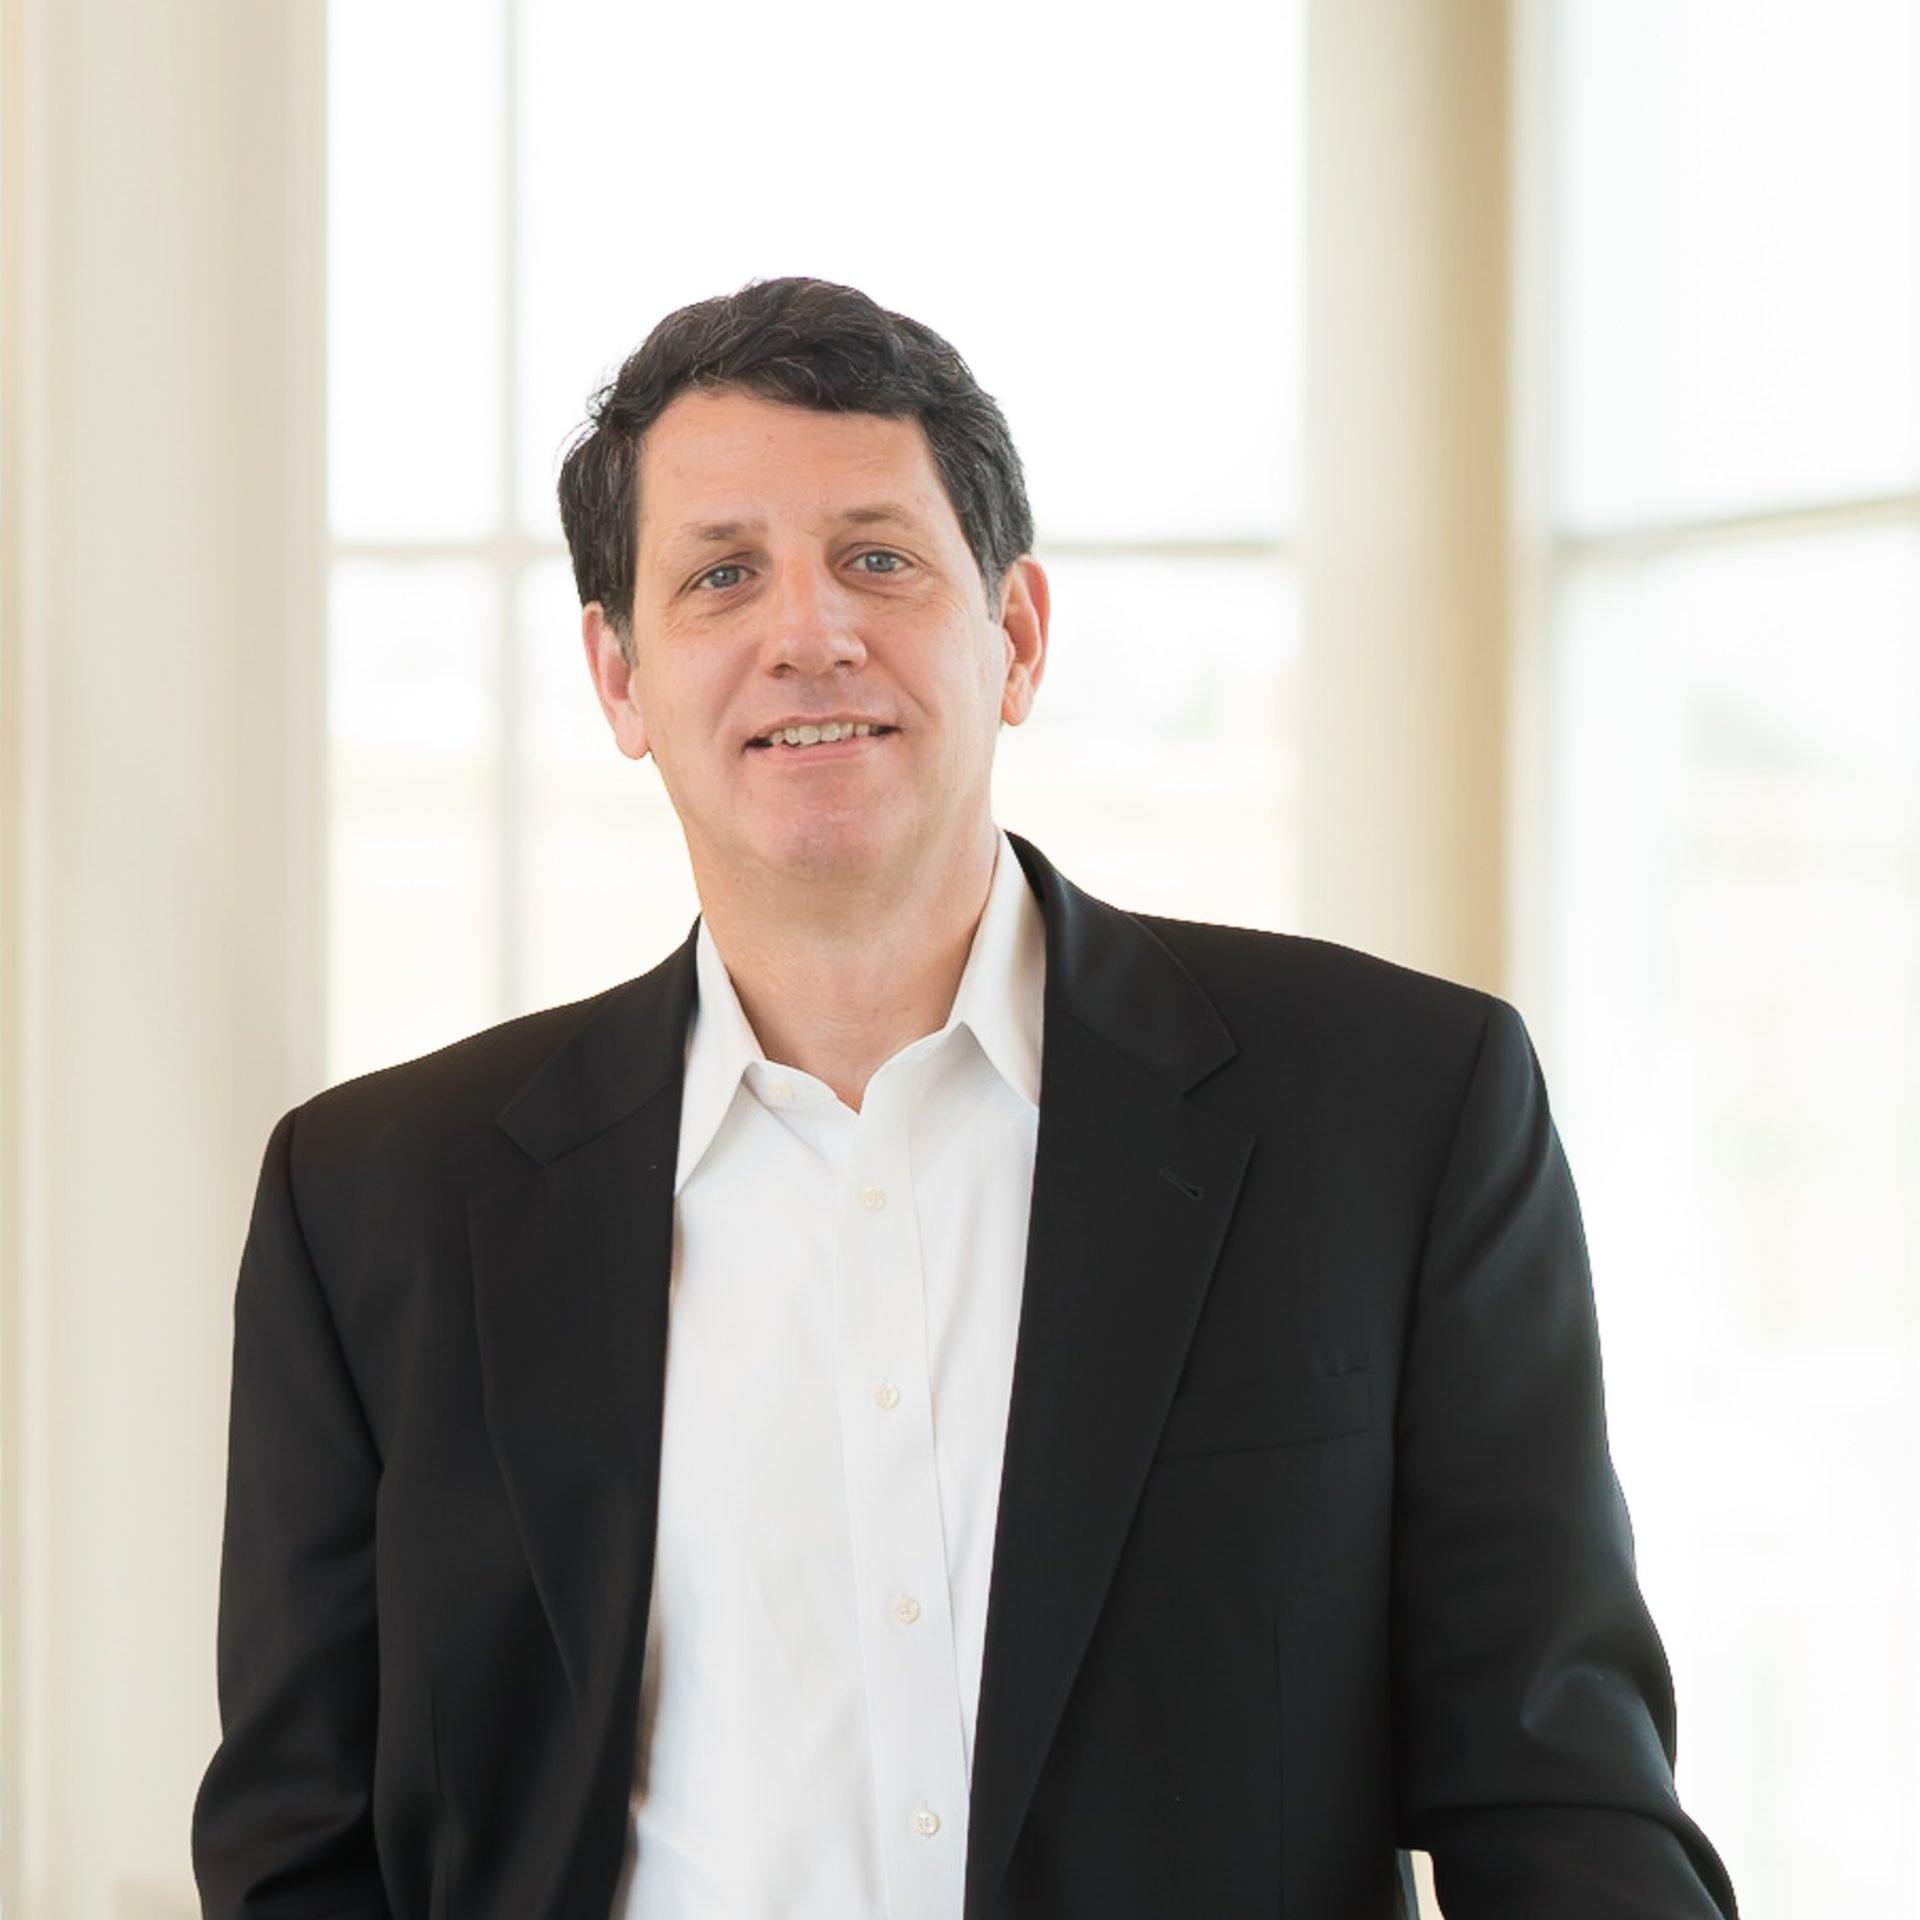 Drew Kepley, AIA, LEED AP<br>Principal